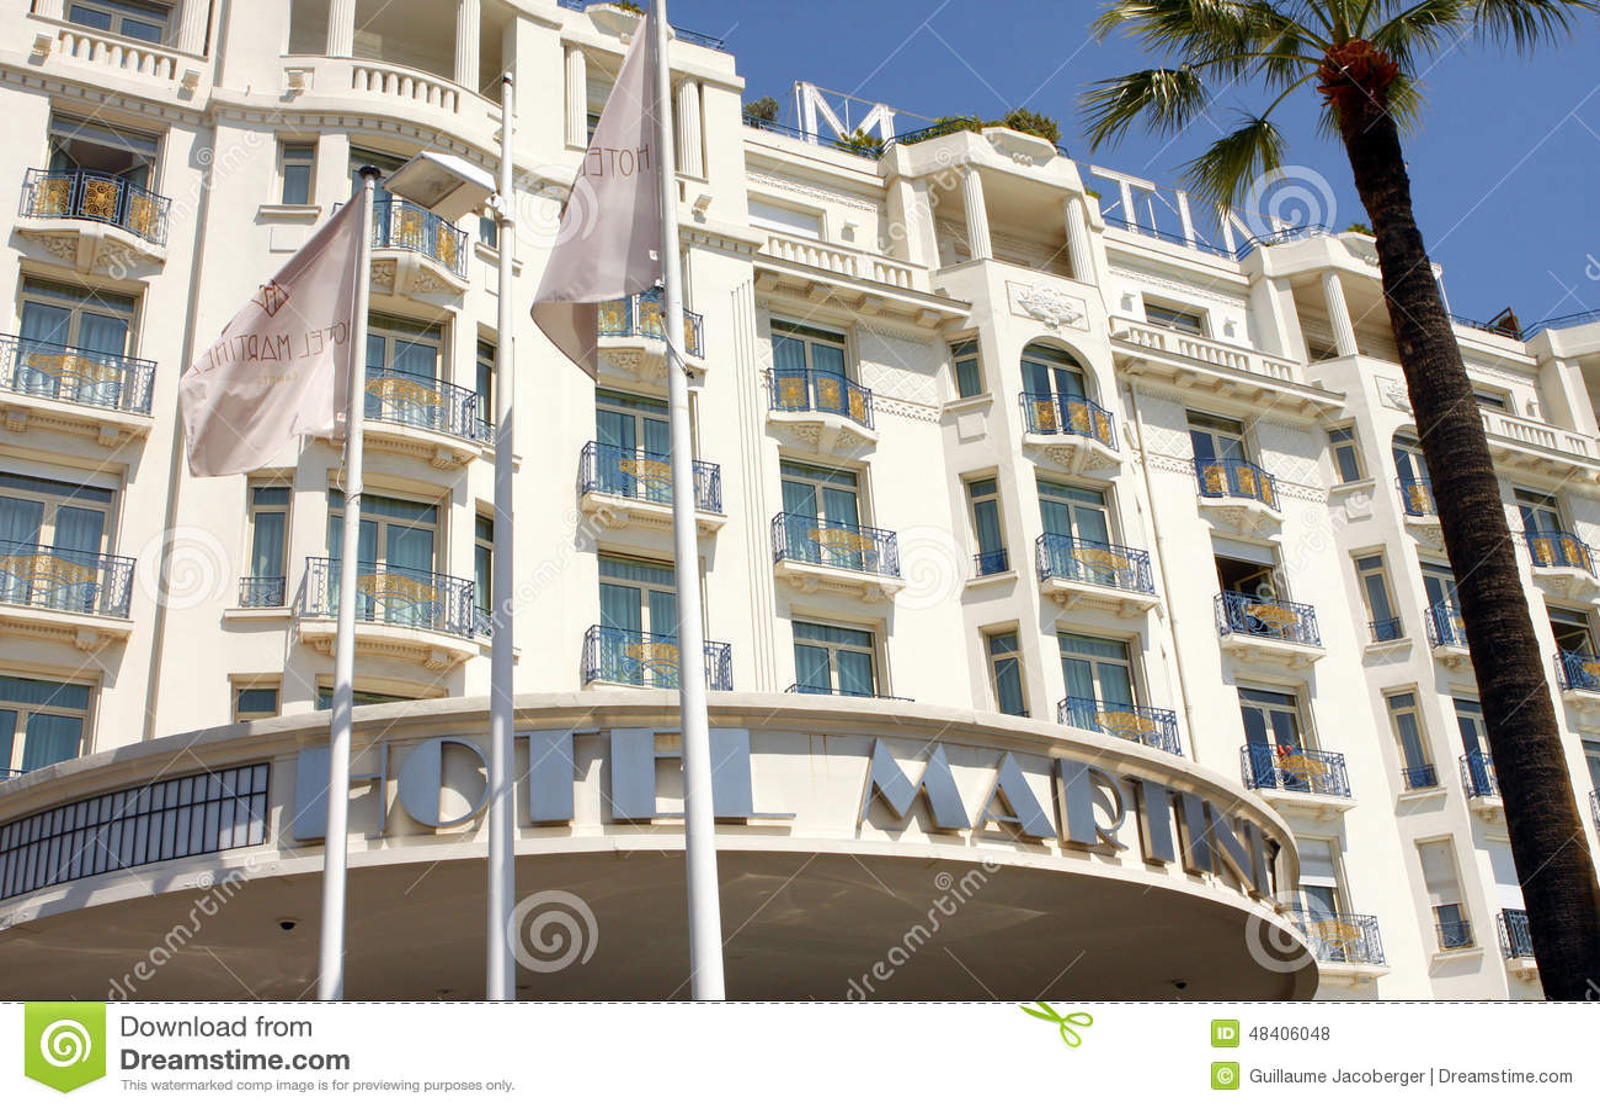 Martinez Hotel - Cannes